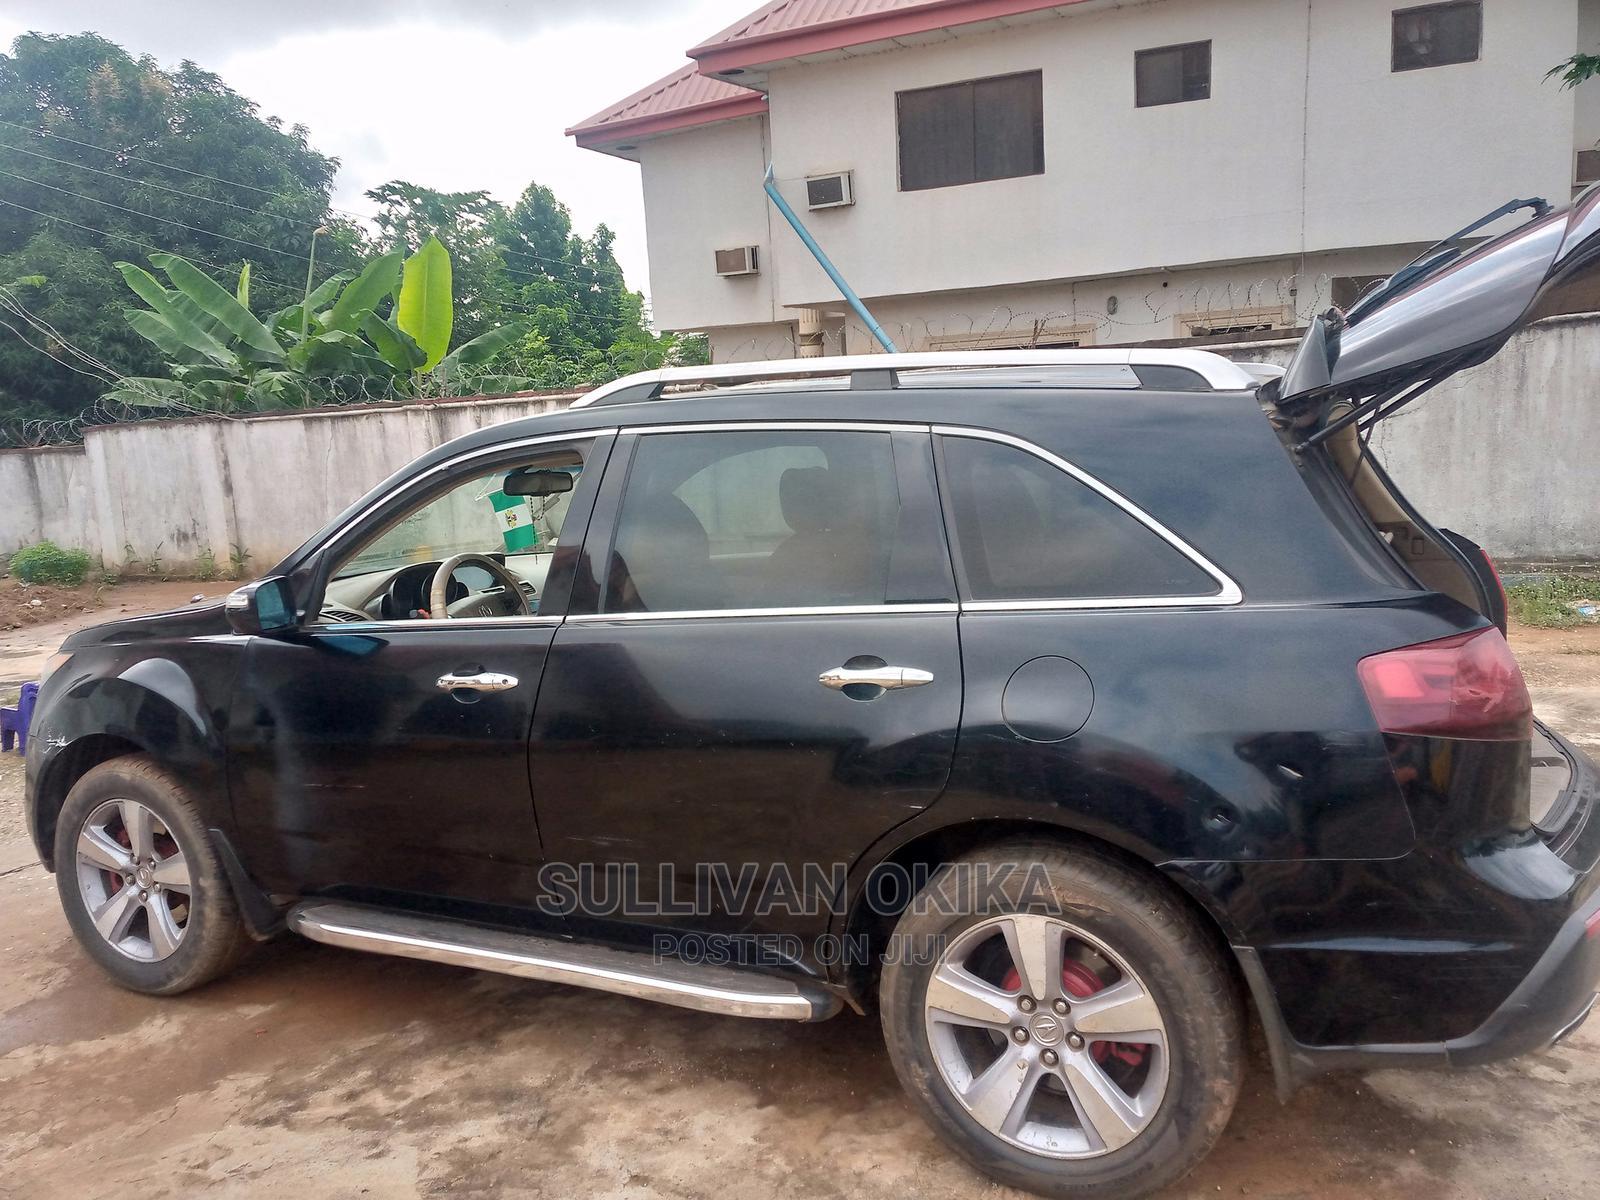 Acura MDX 2011 Black | Cars for sale in Makurdi, Benue State, Nigeria